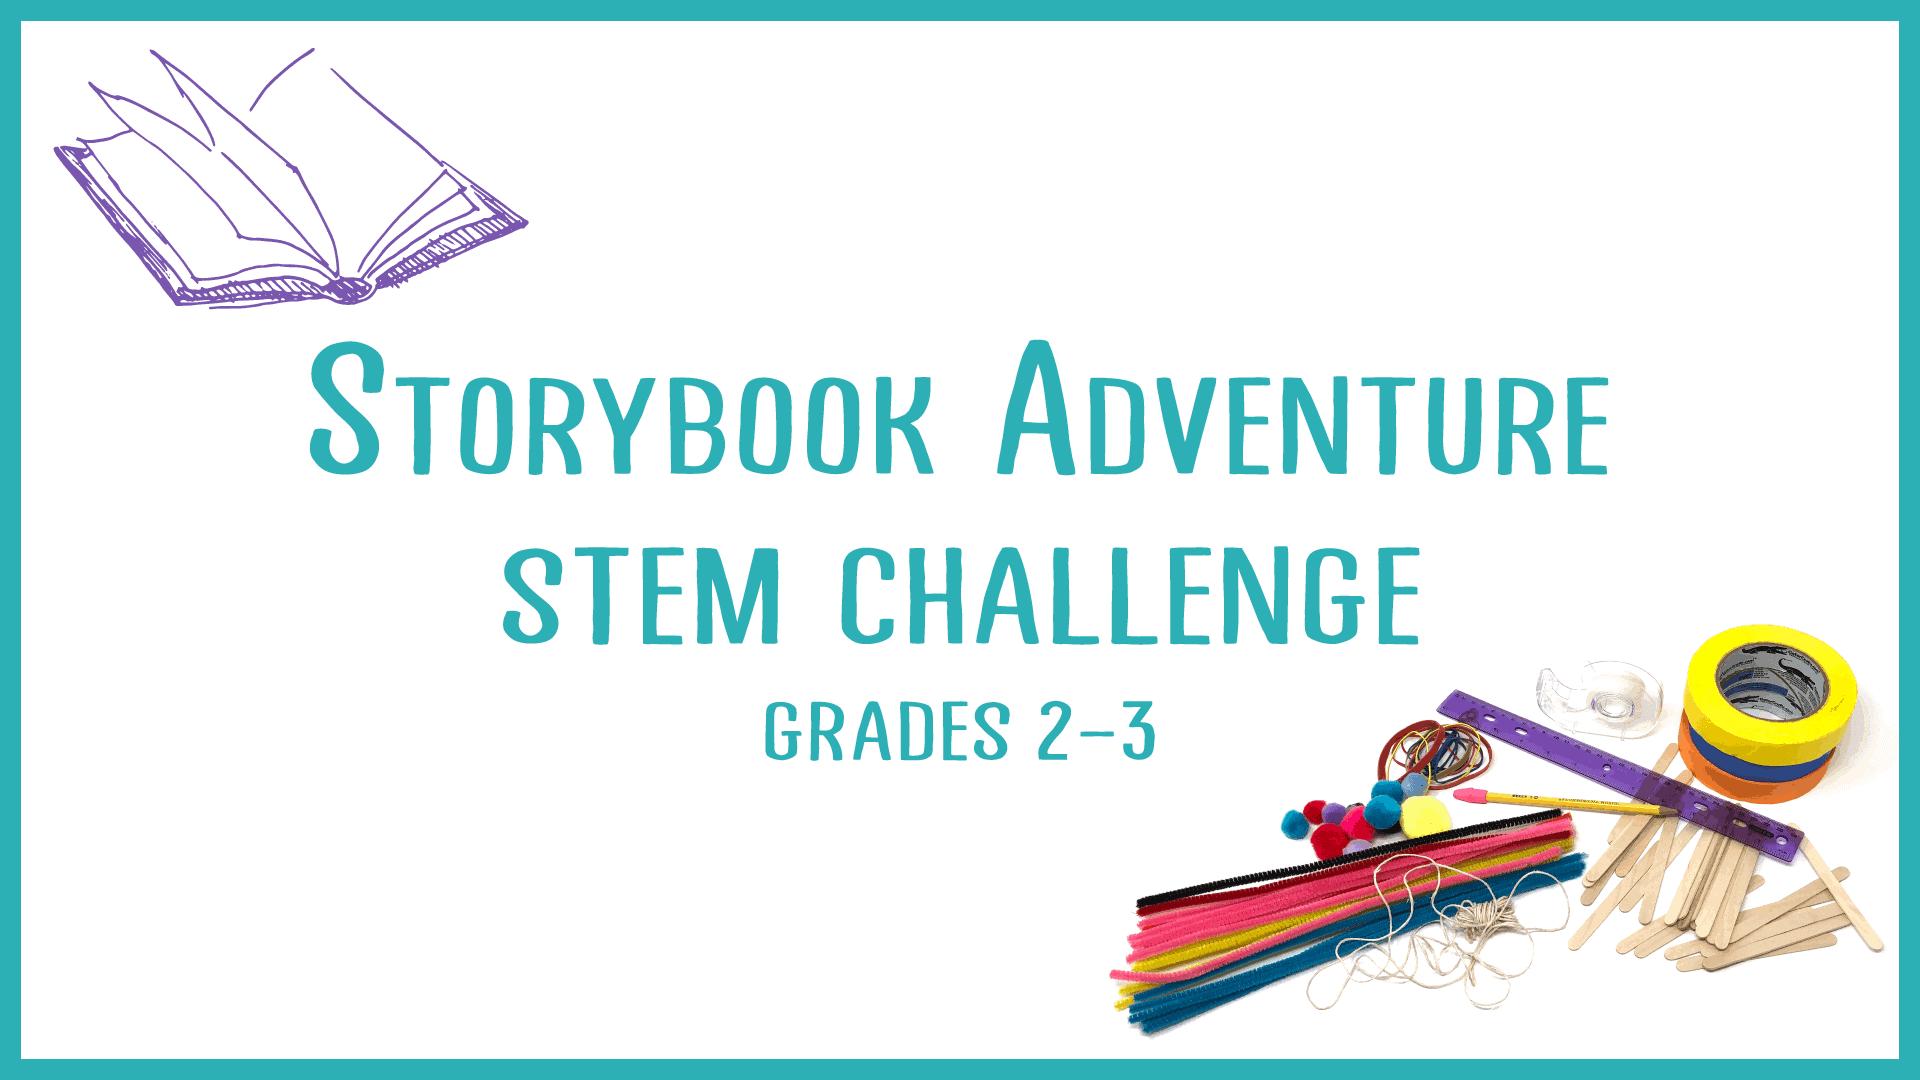 Storybook Adventure STEM Challenge